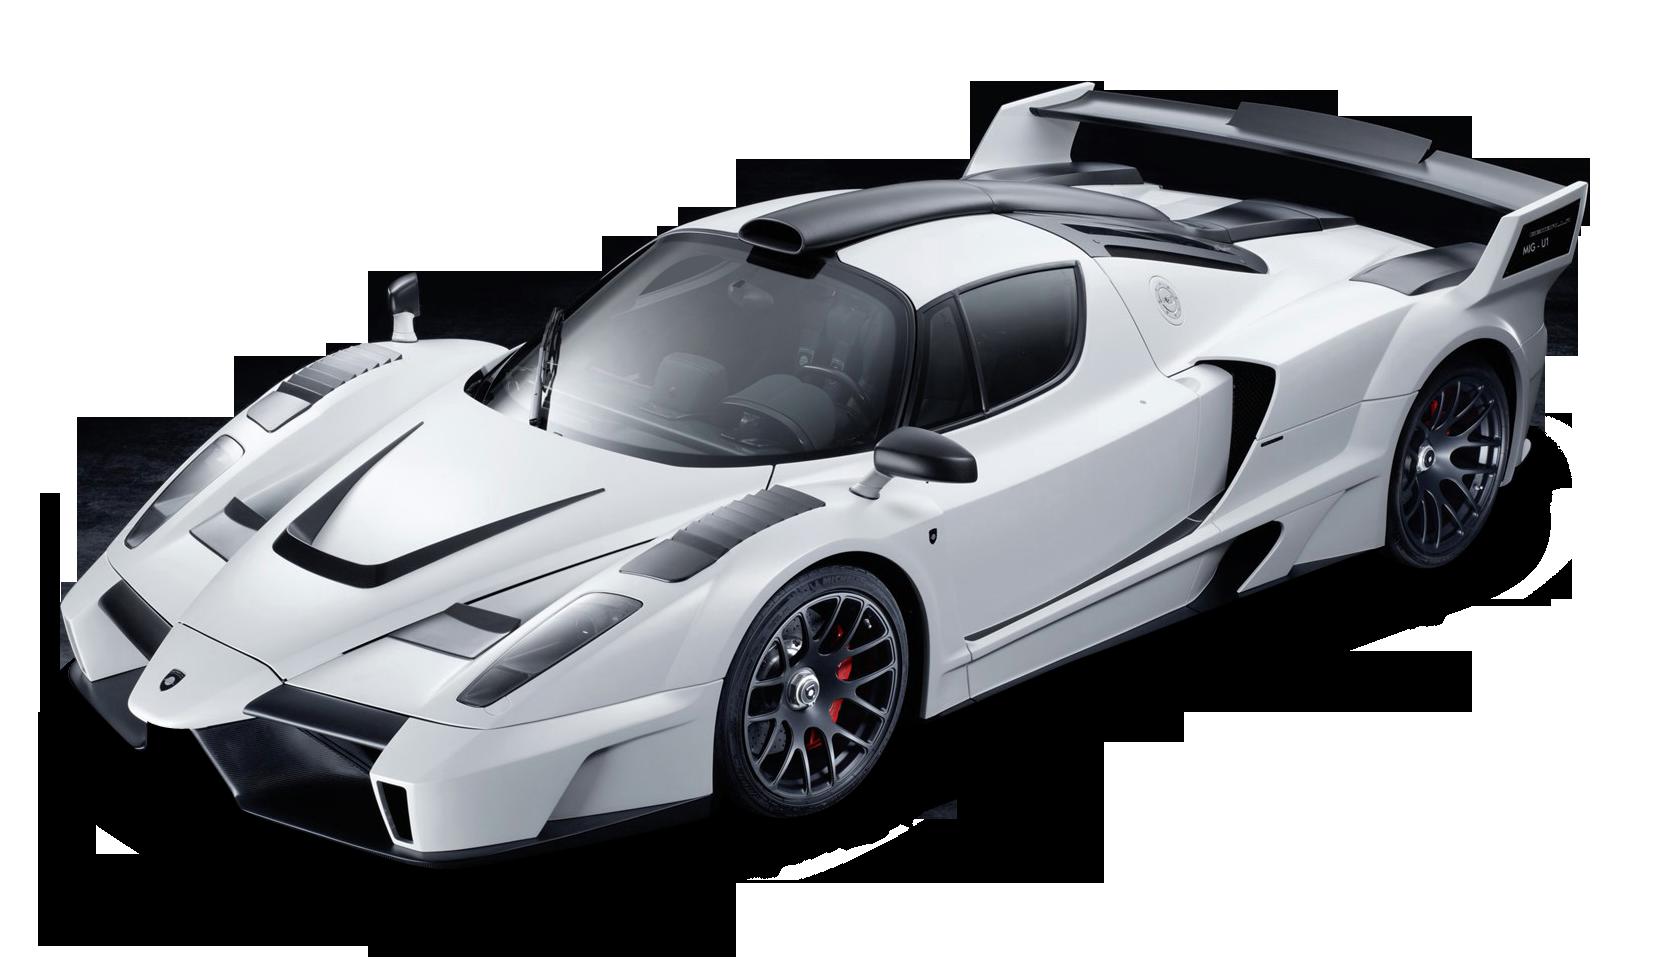 Racing Cars Png Hd Transparent Racing Cars Hd Png Images Pluspng